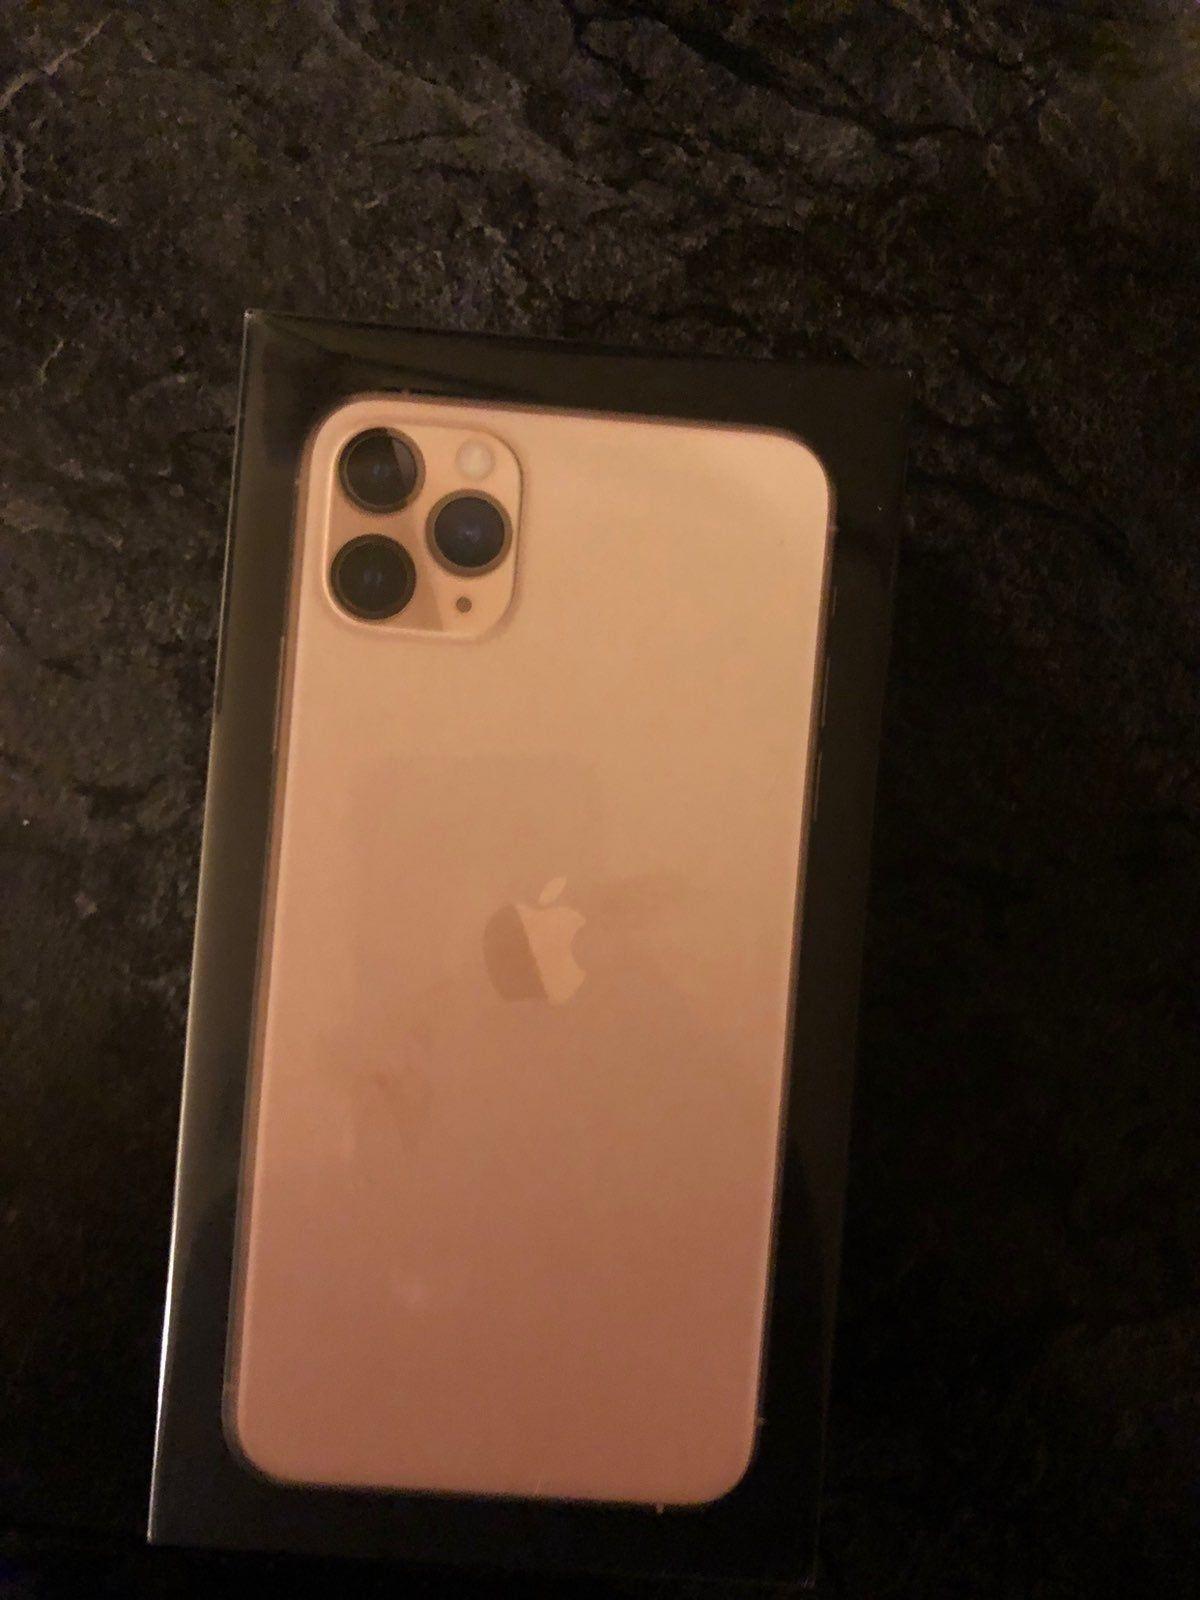 Iphone 11 Pro Max Gold Iphone 11 Pro Max Gold Iphone Iphone 11